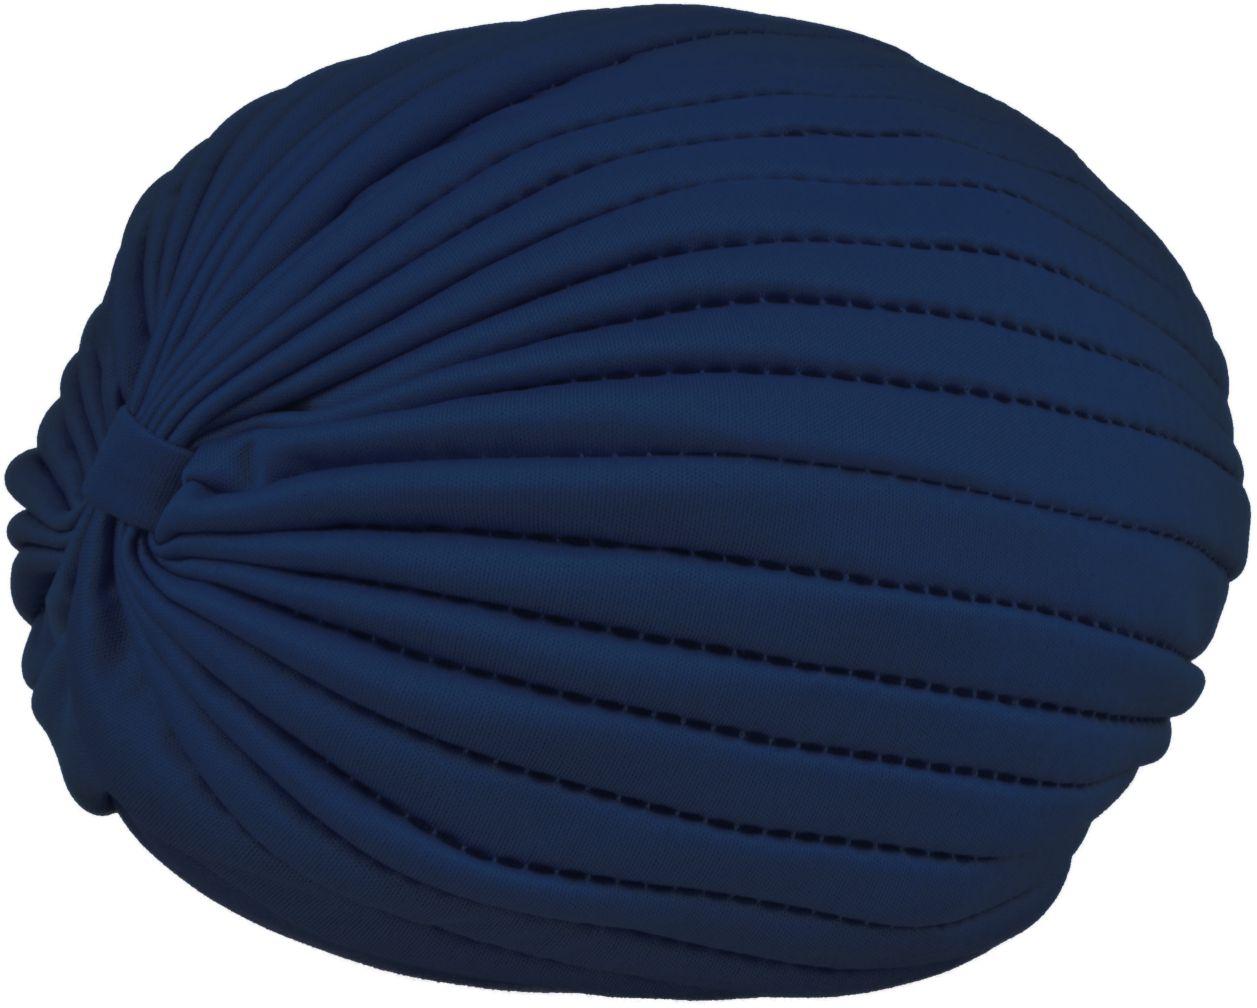 eae2283na_turban-pinup-rockabilly-retro-40s-50-s-emma-bleu-marine